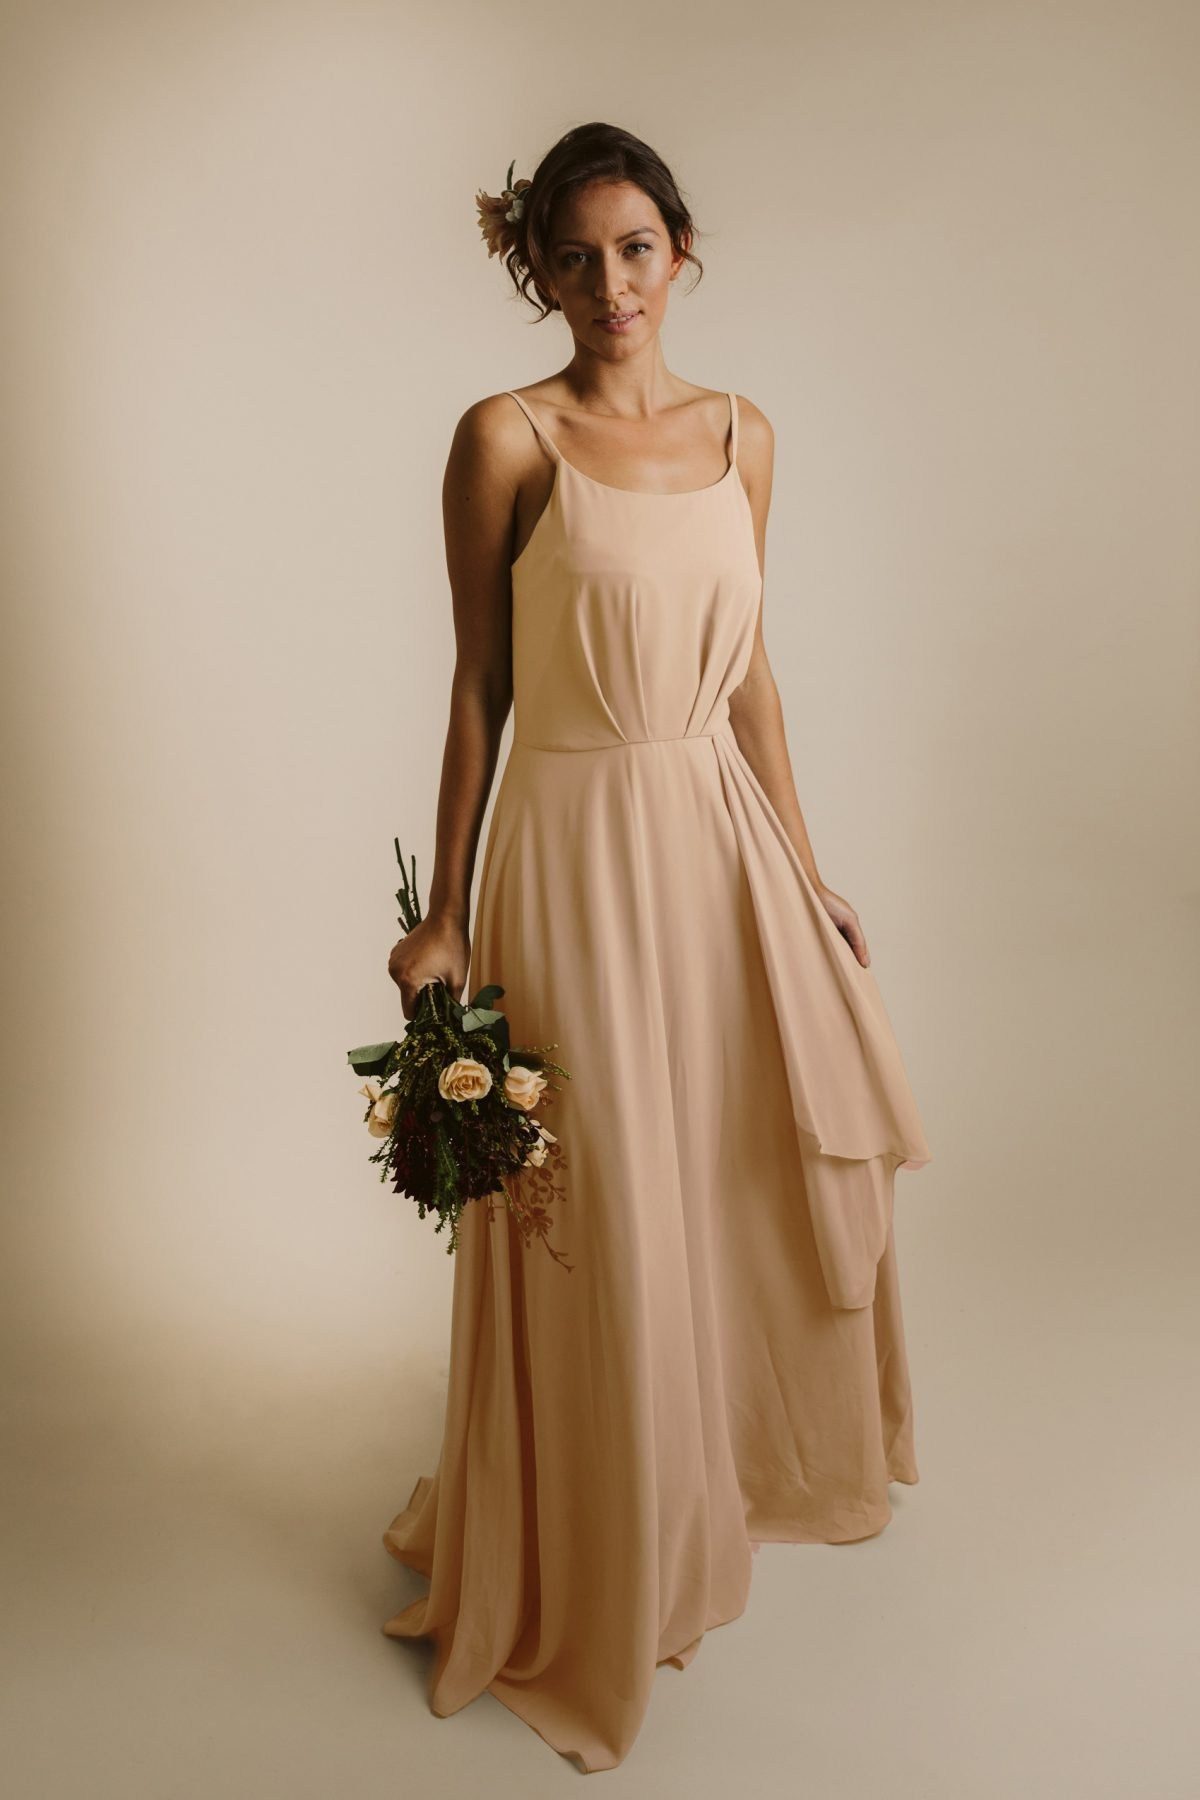 Chiffon Bridesmaid Dresses NZ